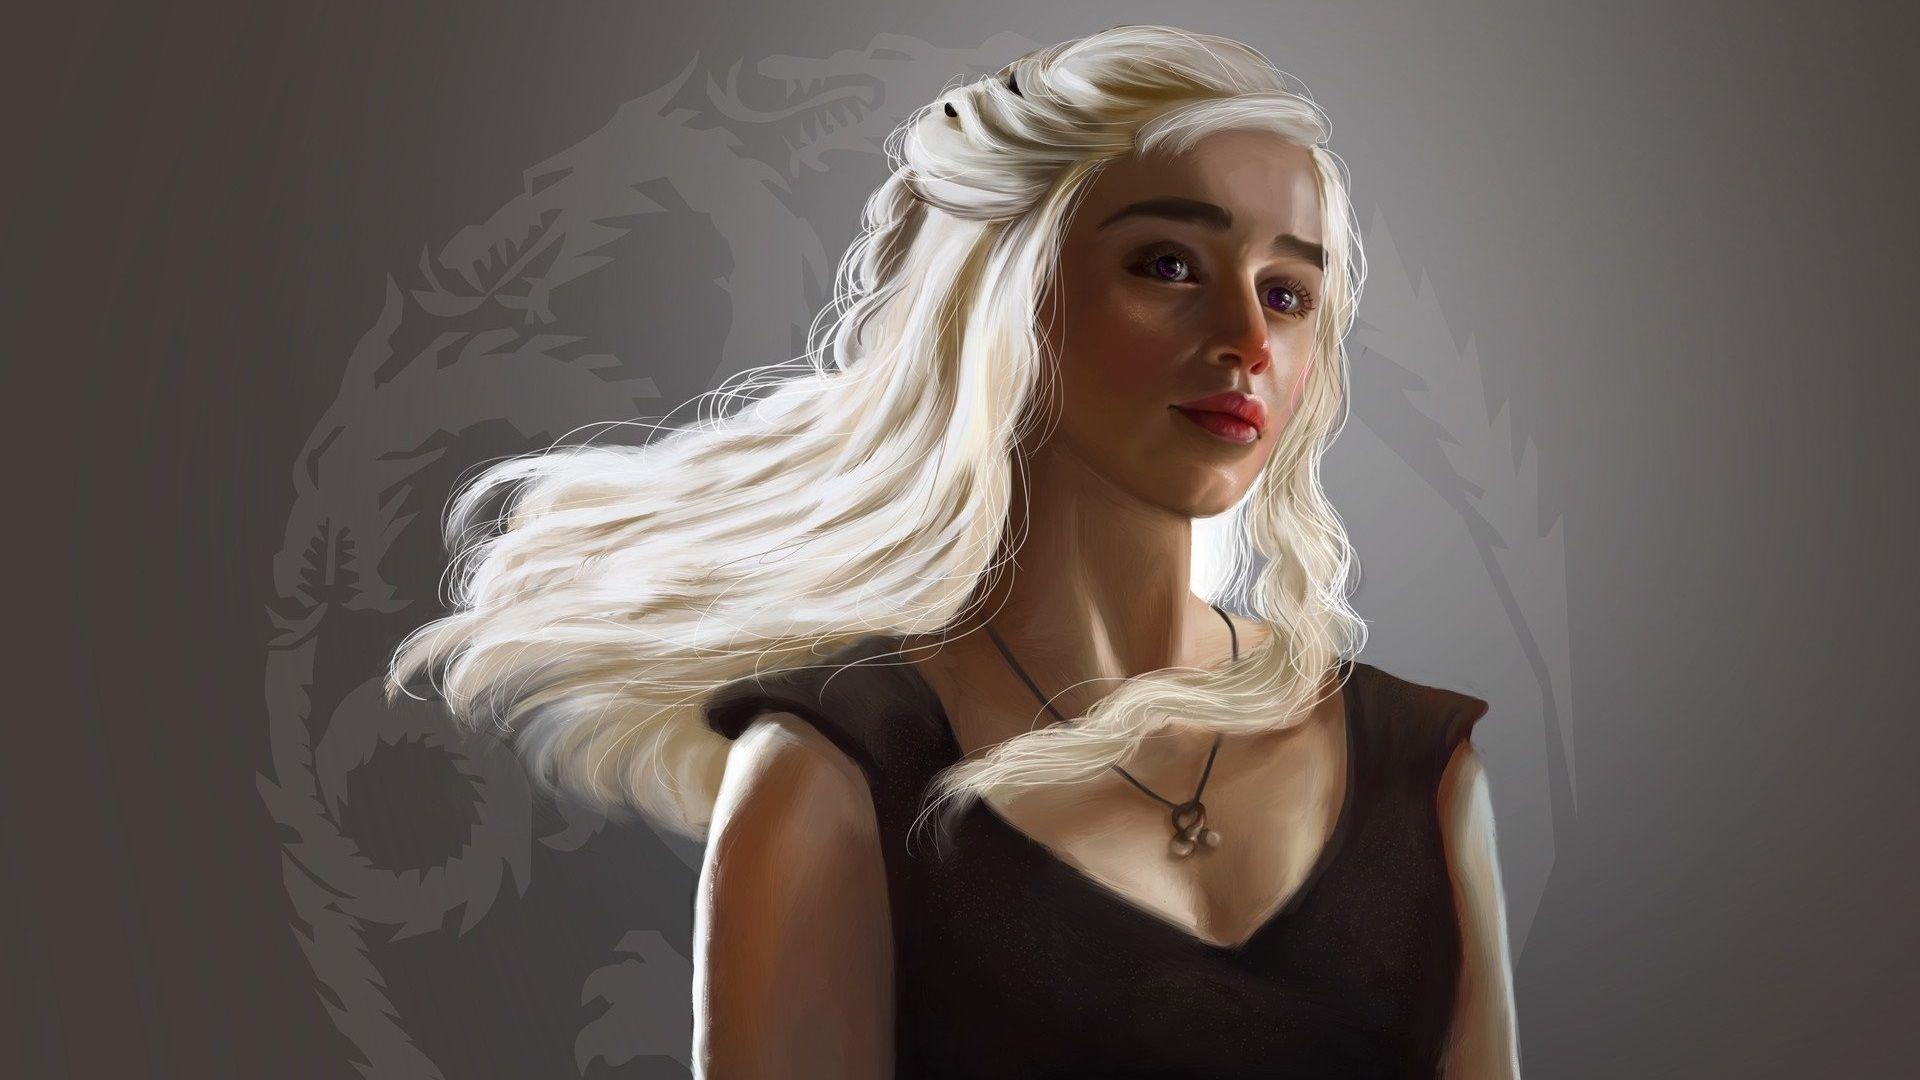 Game of Thrones Daenerys art